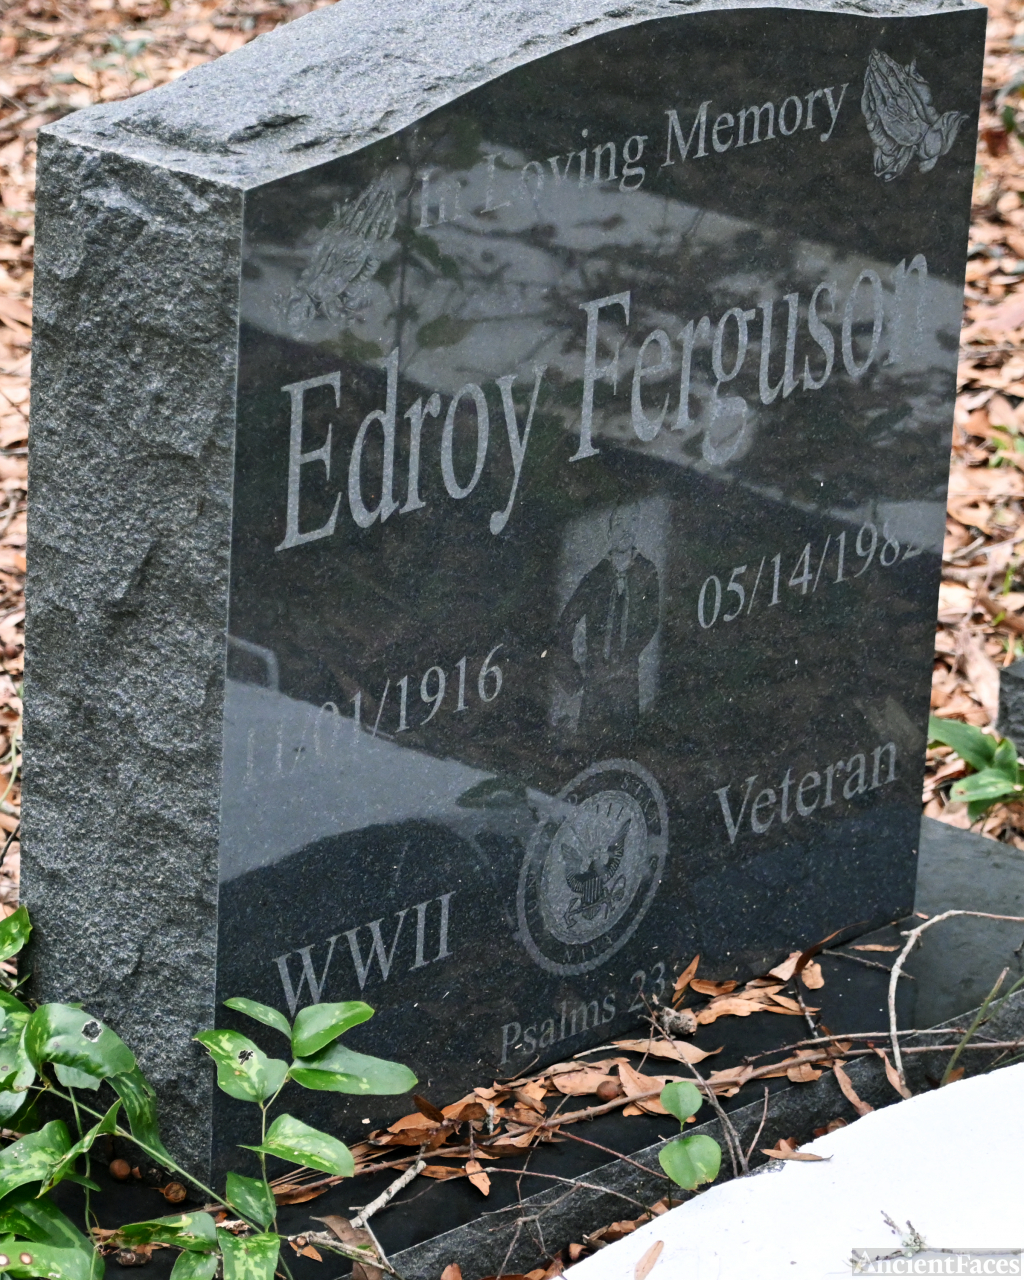 Edroy Ferguson